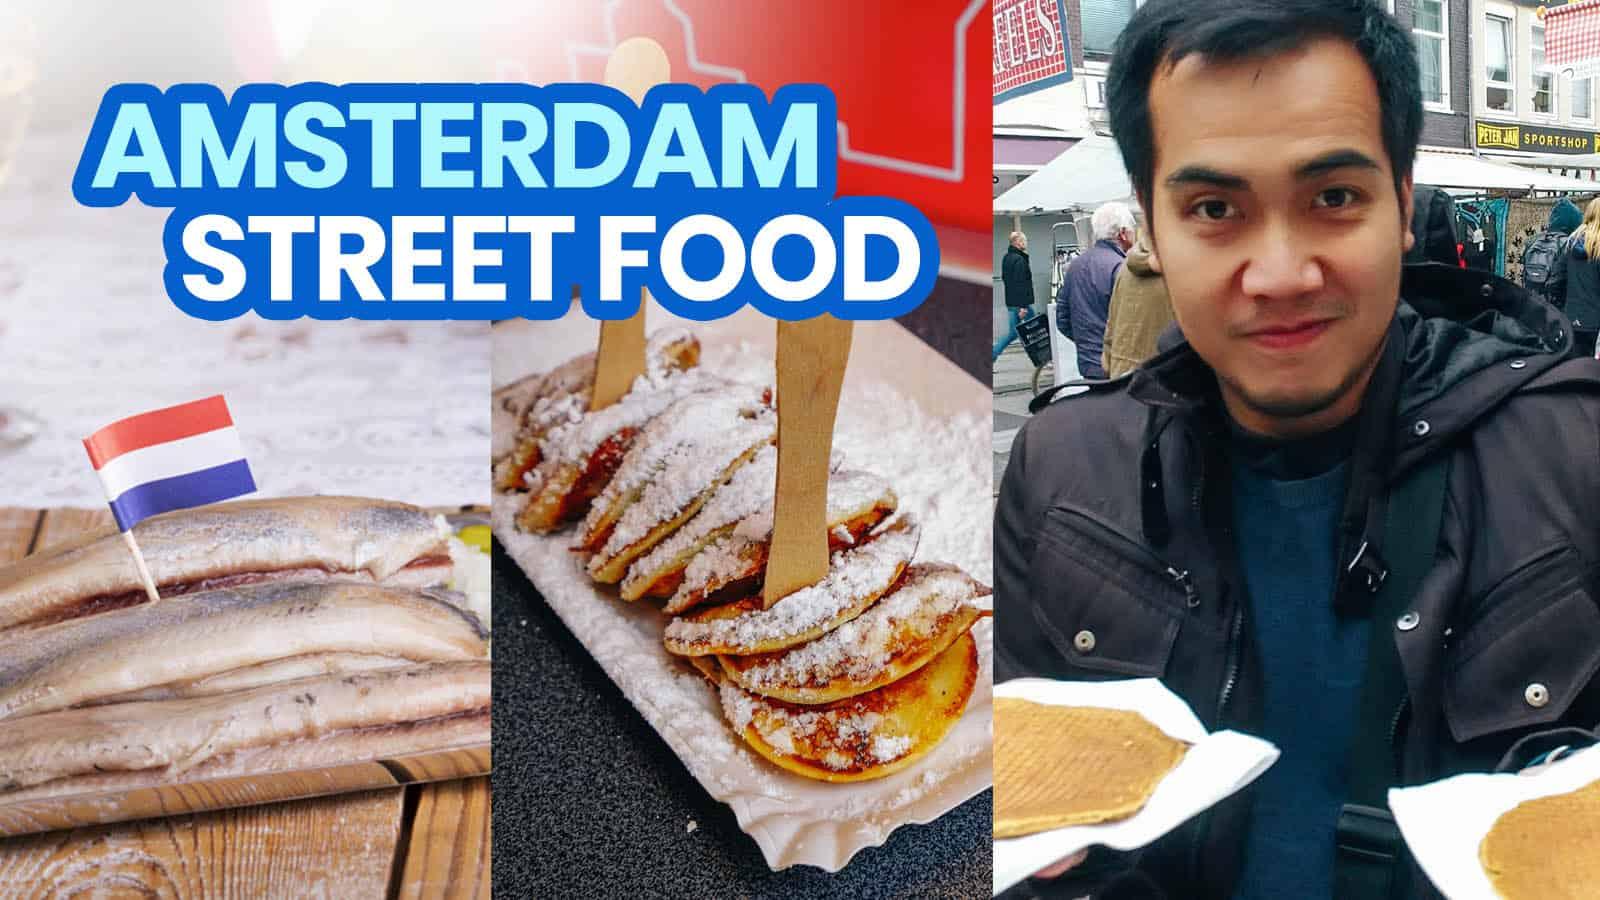 10 AMSTERDAM STREET FOOD TREATS You Shouldn't Miss | The ...